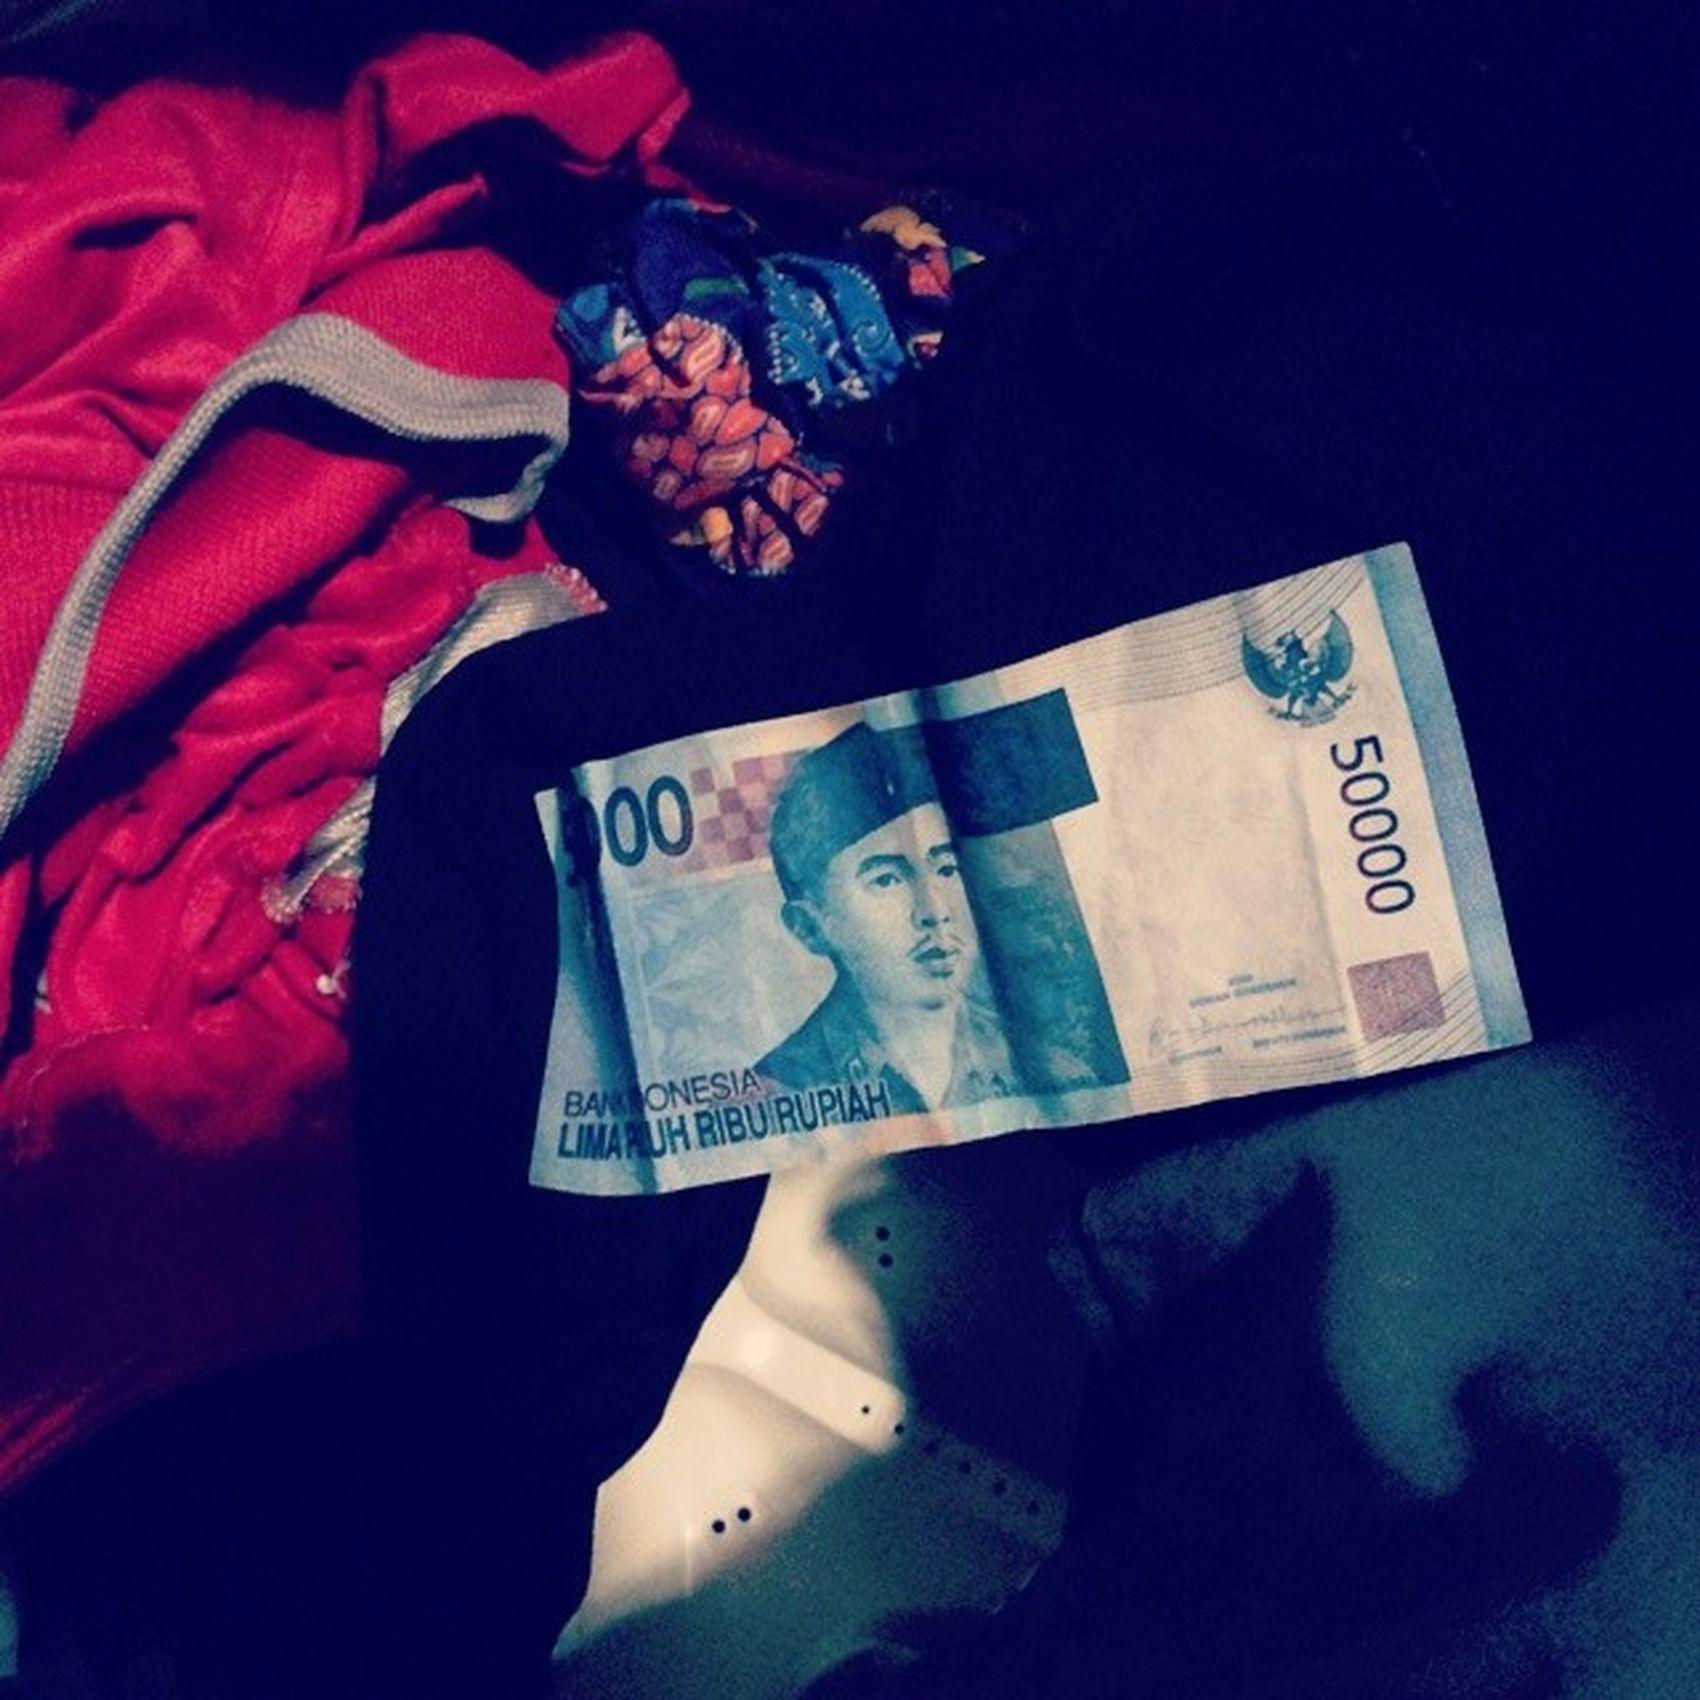 Nemu uang 1 lembar warna biru tulisannya Limapuluhriburupiah di mesin cuci seragam saya. Alhamdulillah saya masih punya uang. Tgl 25 masih lama yak?! Miracel Gocap Rezeki .